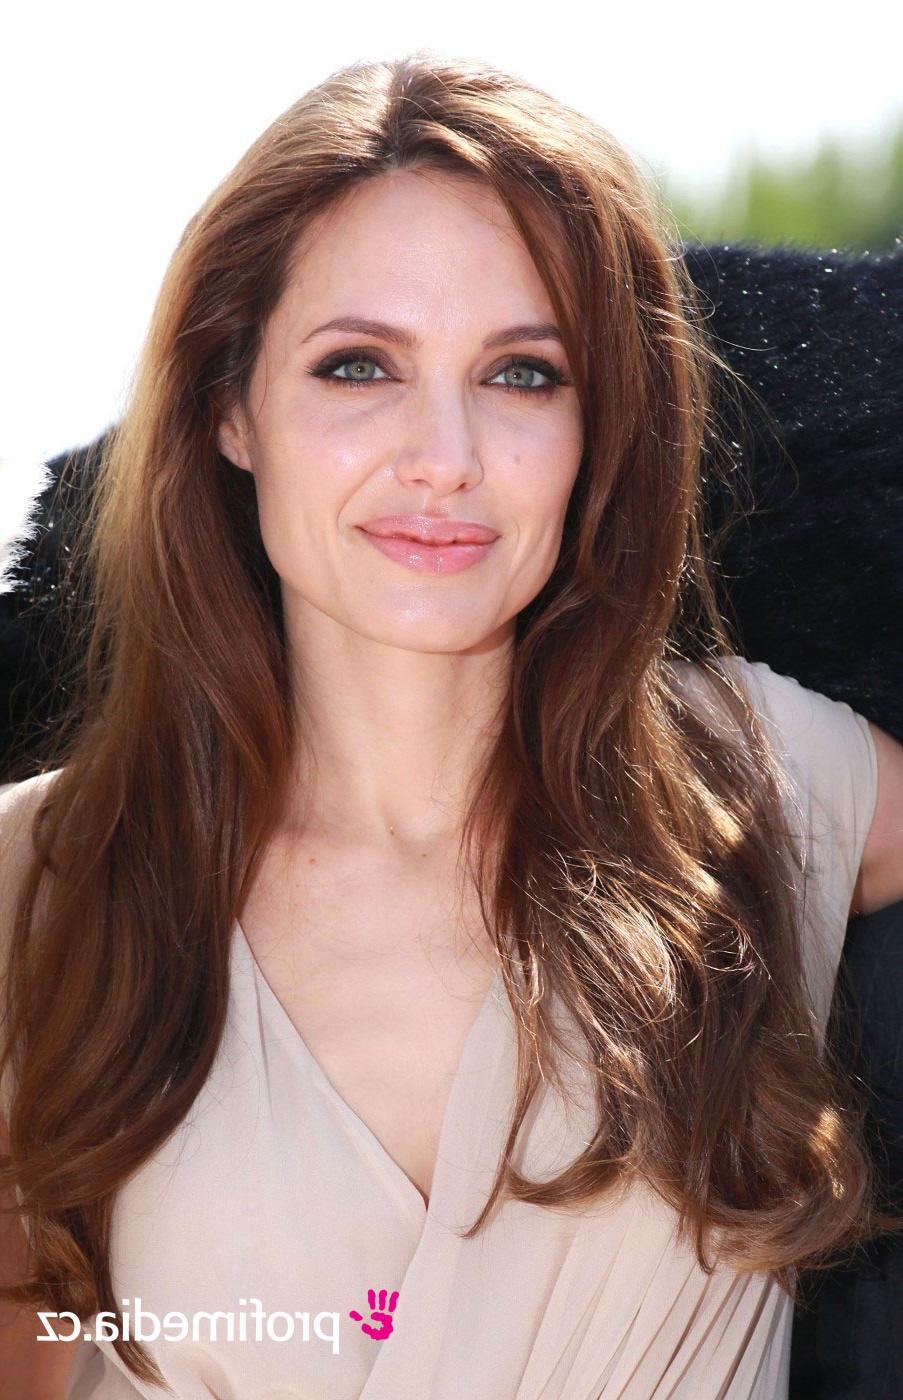 Newest Angelina Jolie Medium Hairstyles Intended For Angelina Jolie – – Hairstyle – Easyhairstyler (View 16 of 20)